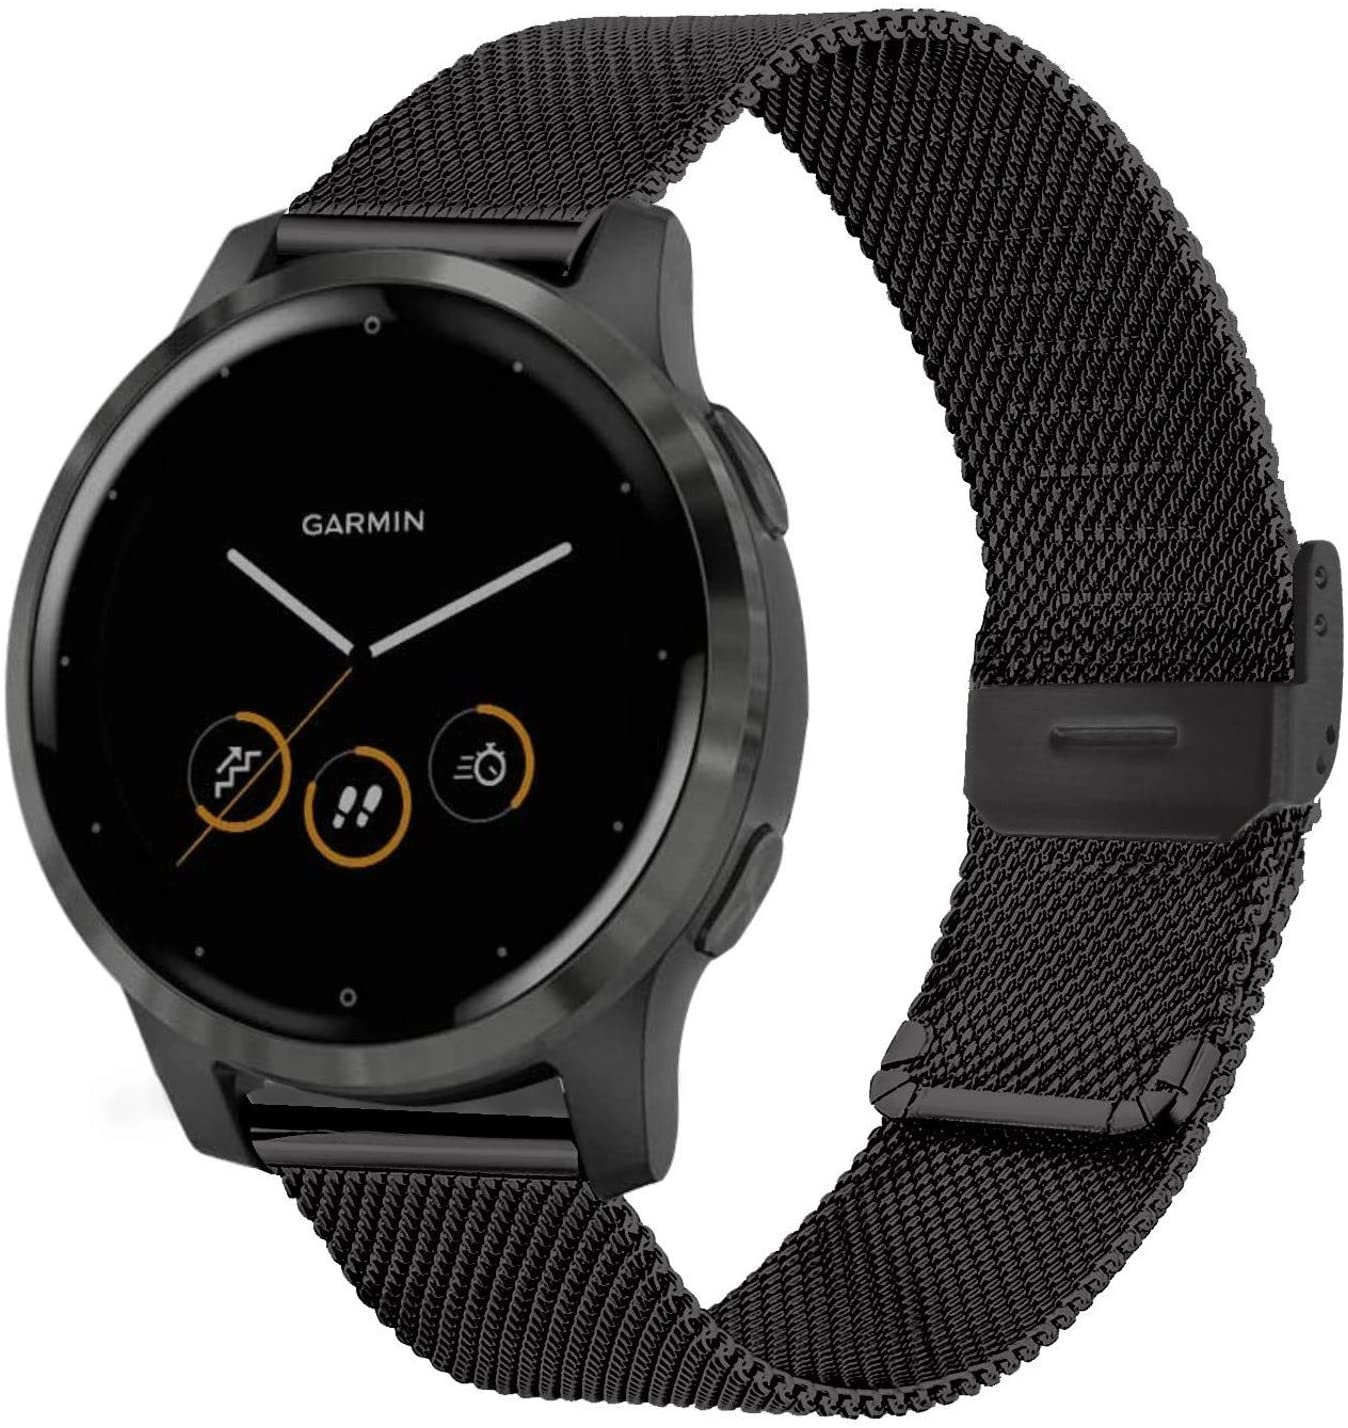 Stainless Steel Watch Bands for Garmin Vivoactive 4S 40mm/Vivomove 3S 39mm, Metal Mesh Quick Release Wristband Strap for Fossil Q Venture Gen 4 HR/Gen 3 (Black)